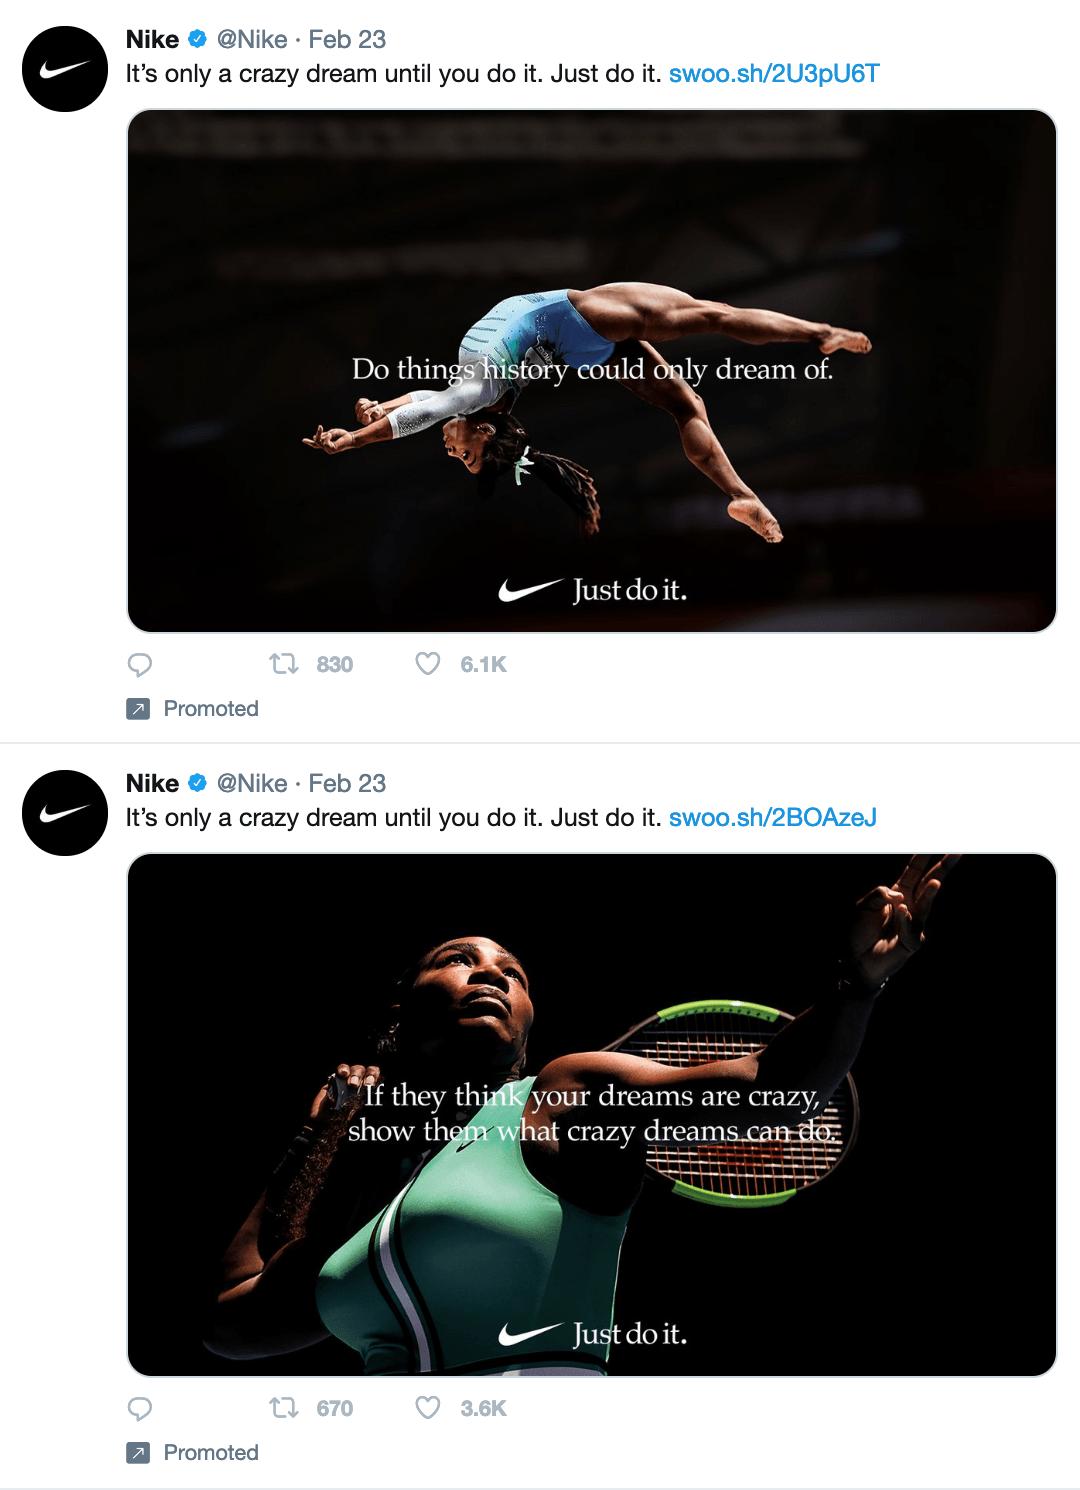 Nike Twitter Ads